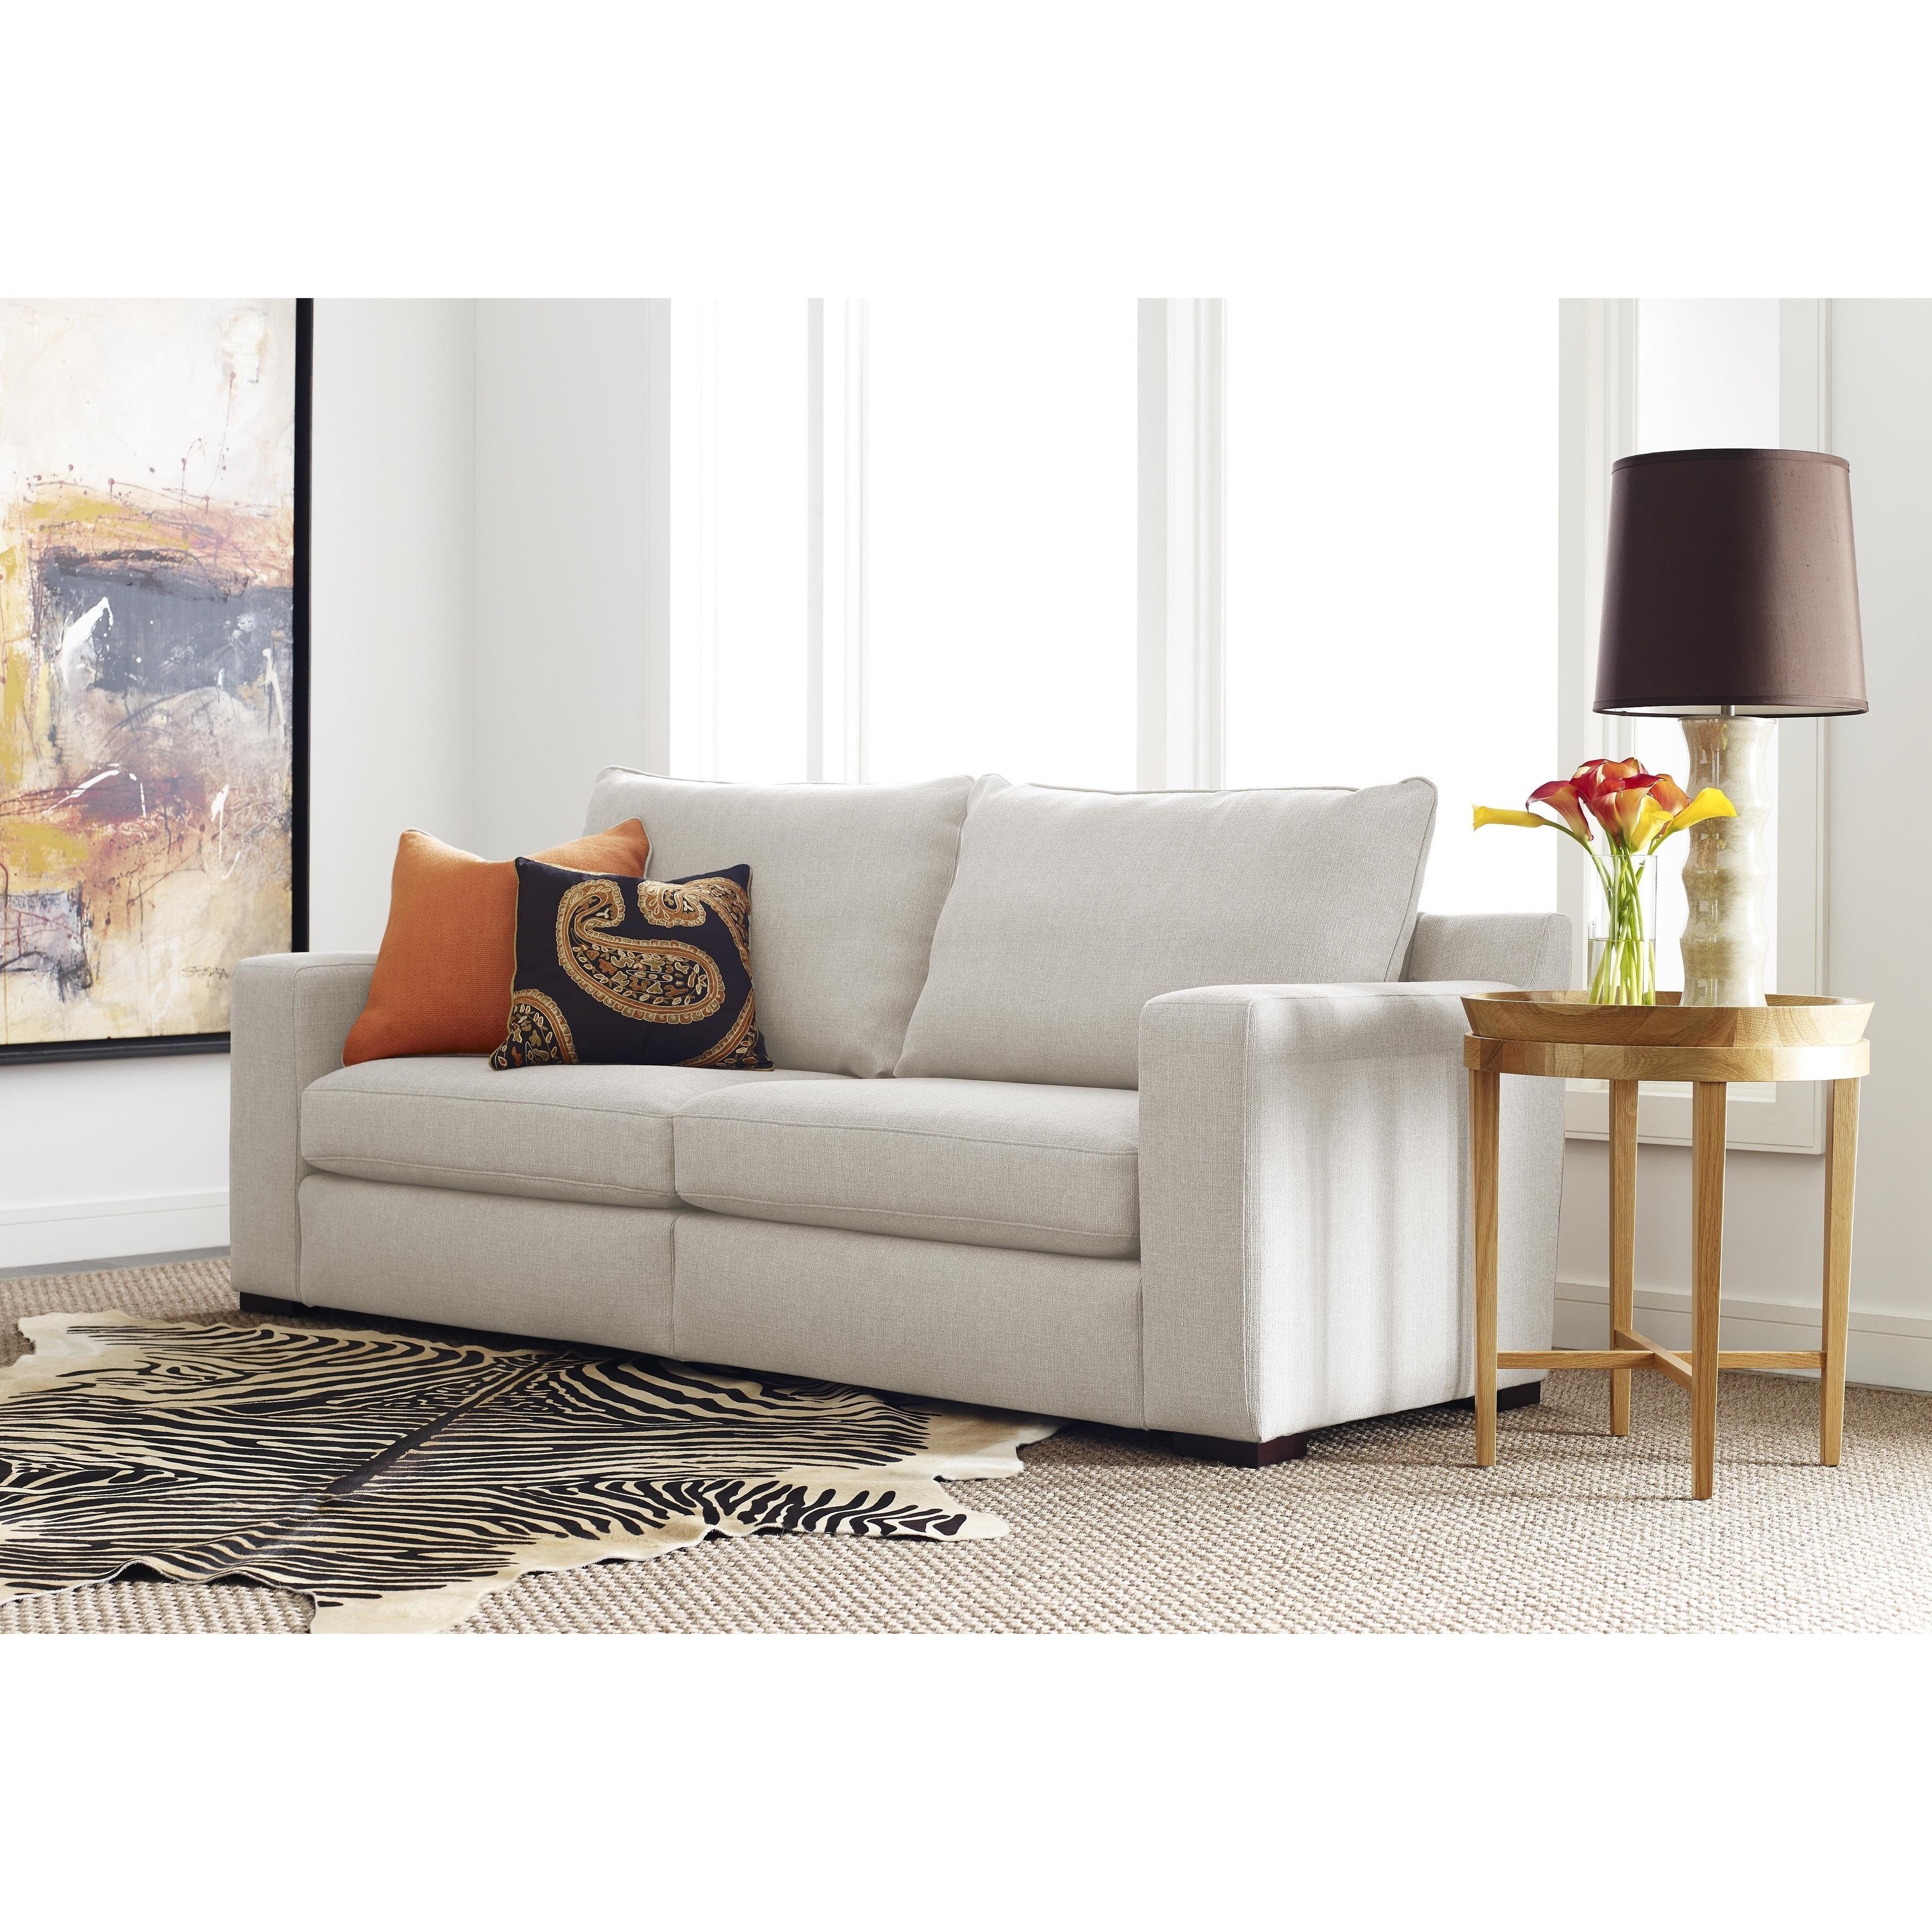 Shop Serta Deep Seating Geneva 85-inch Grey Sofa - Free Shipping ...